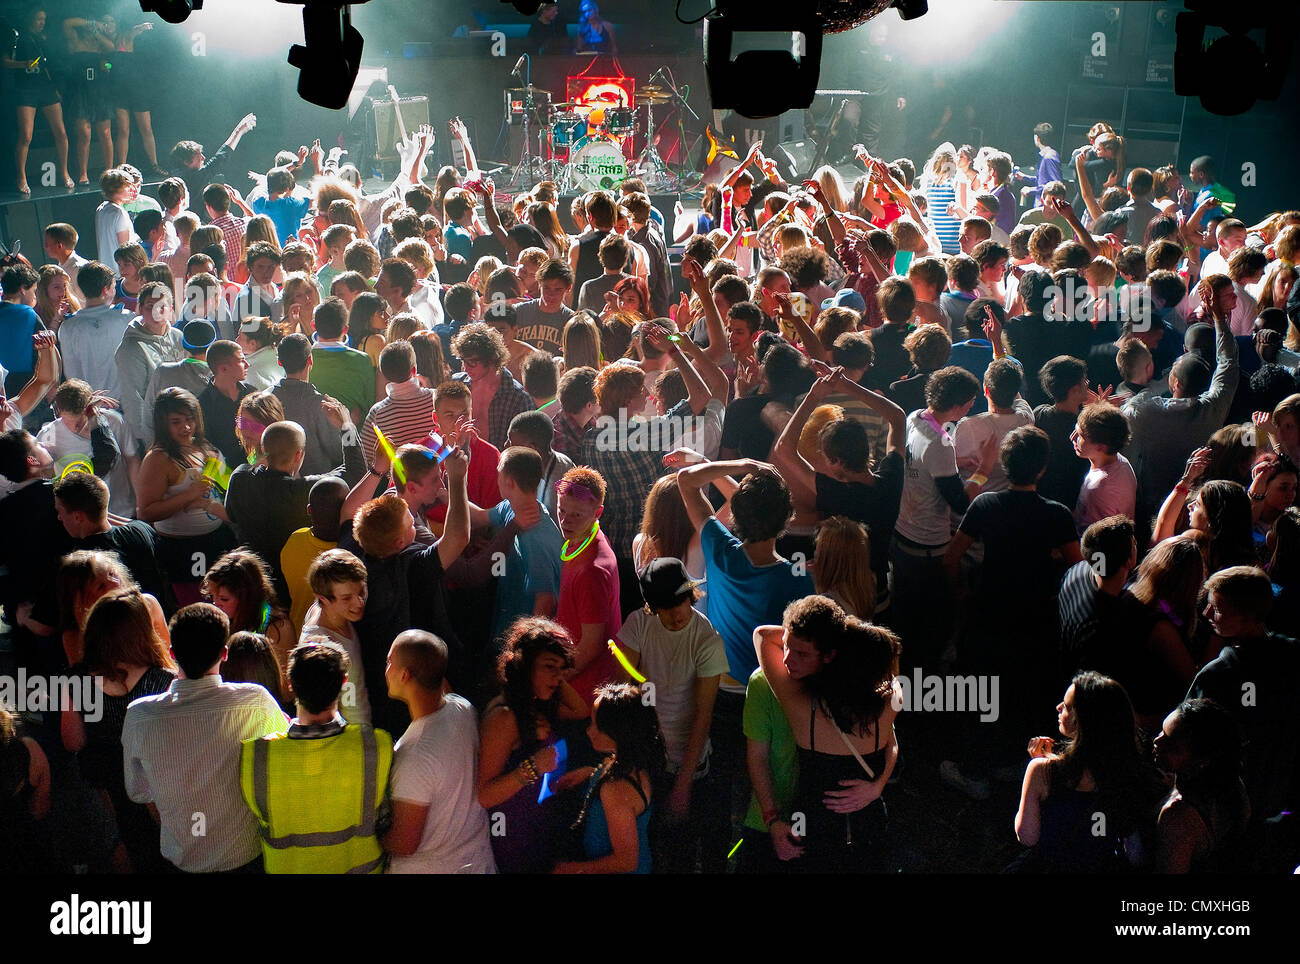 Les adolescents à Newquay, Cornwall la fête. Photo Stock